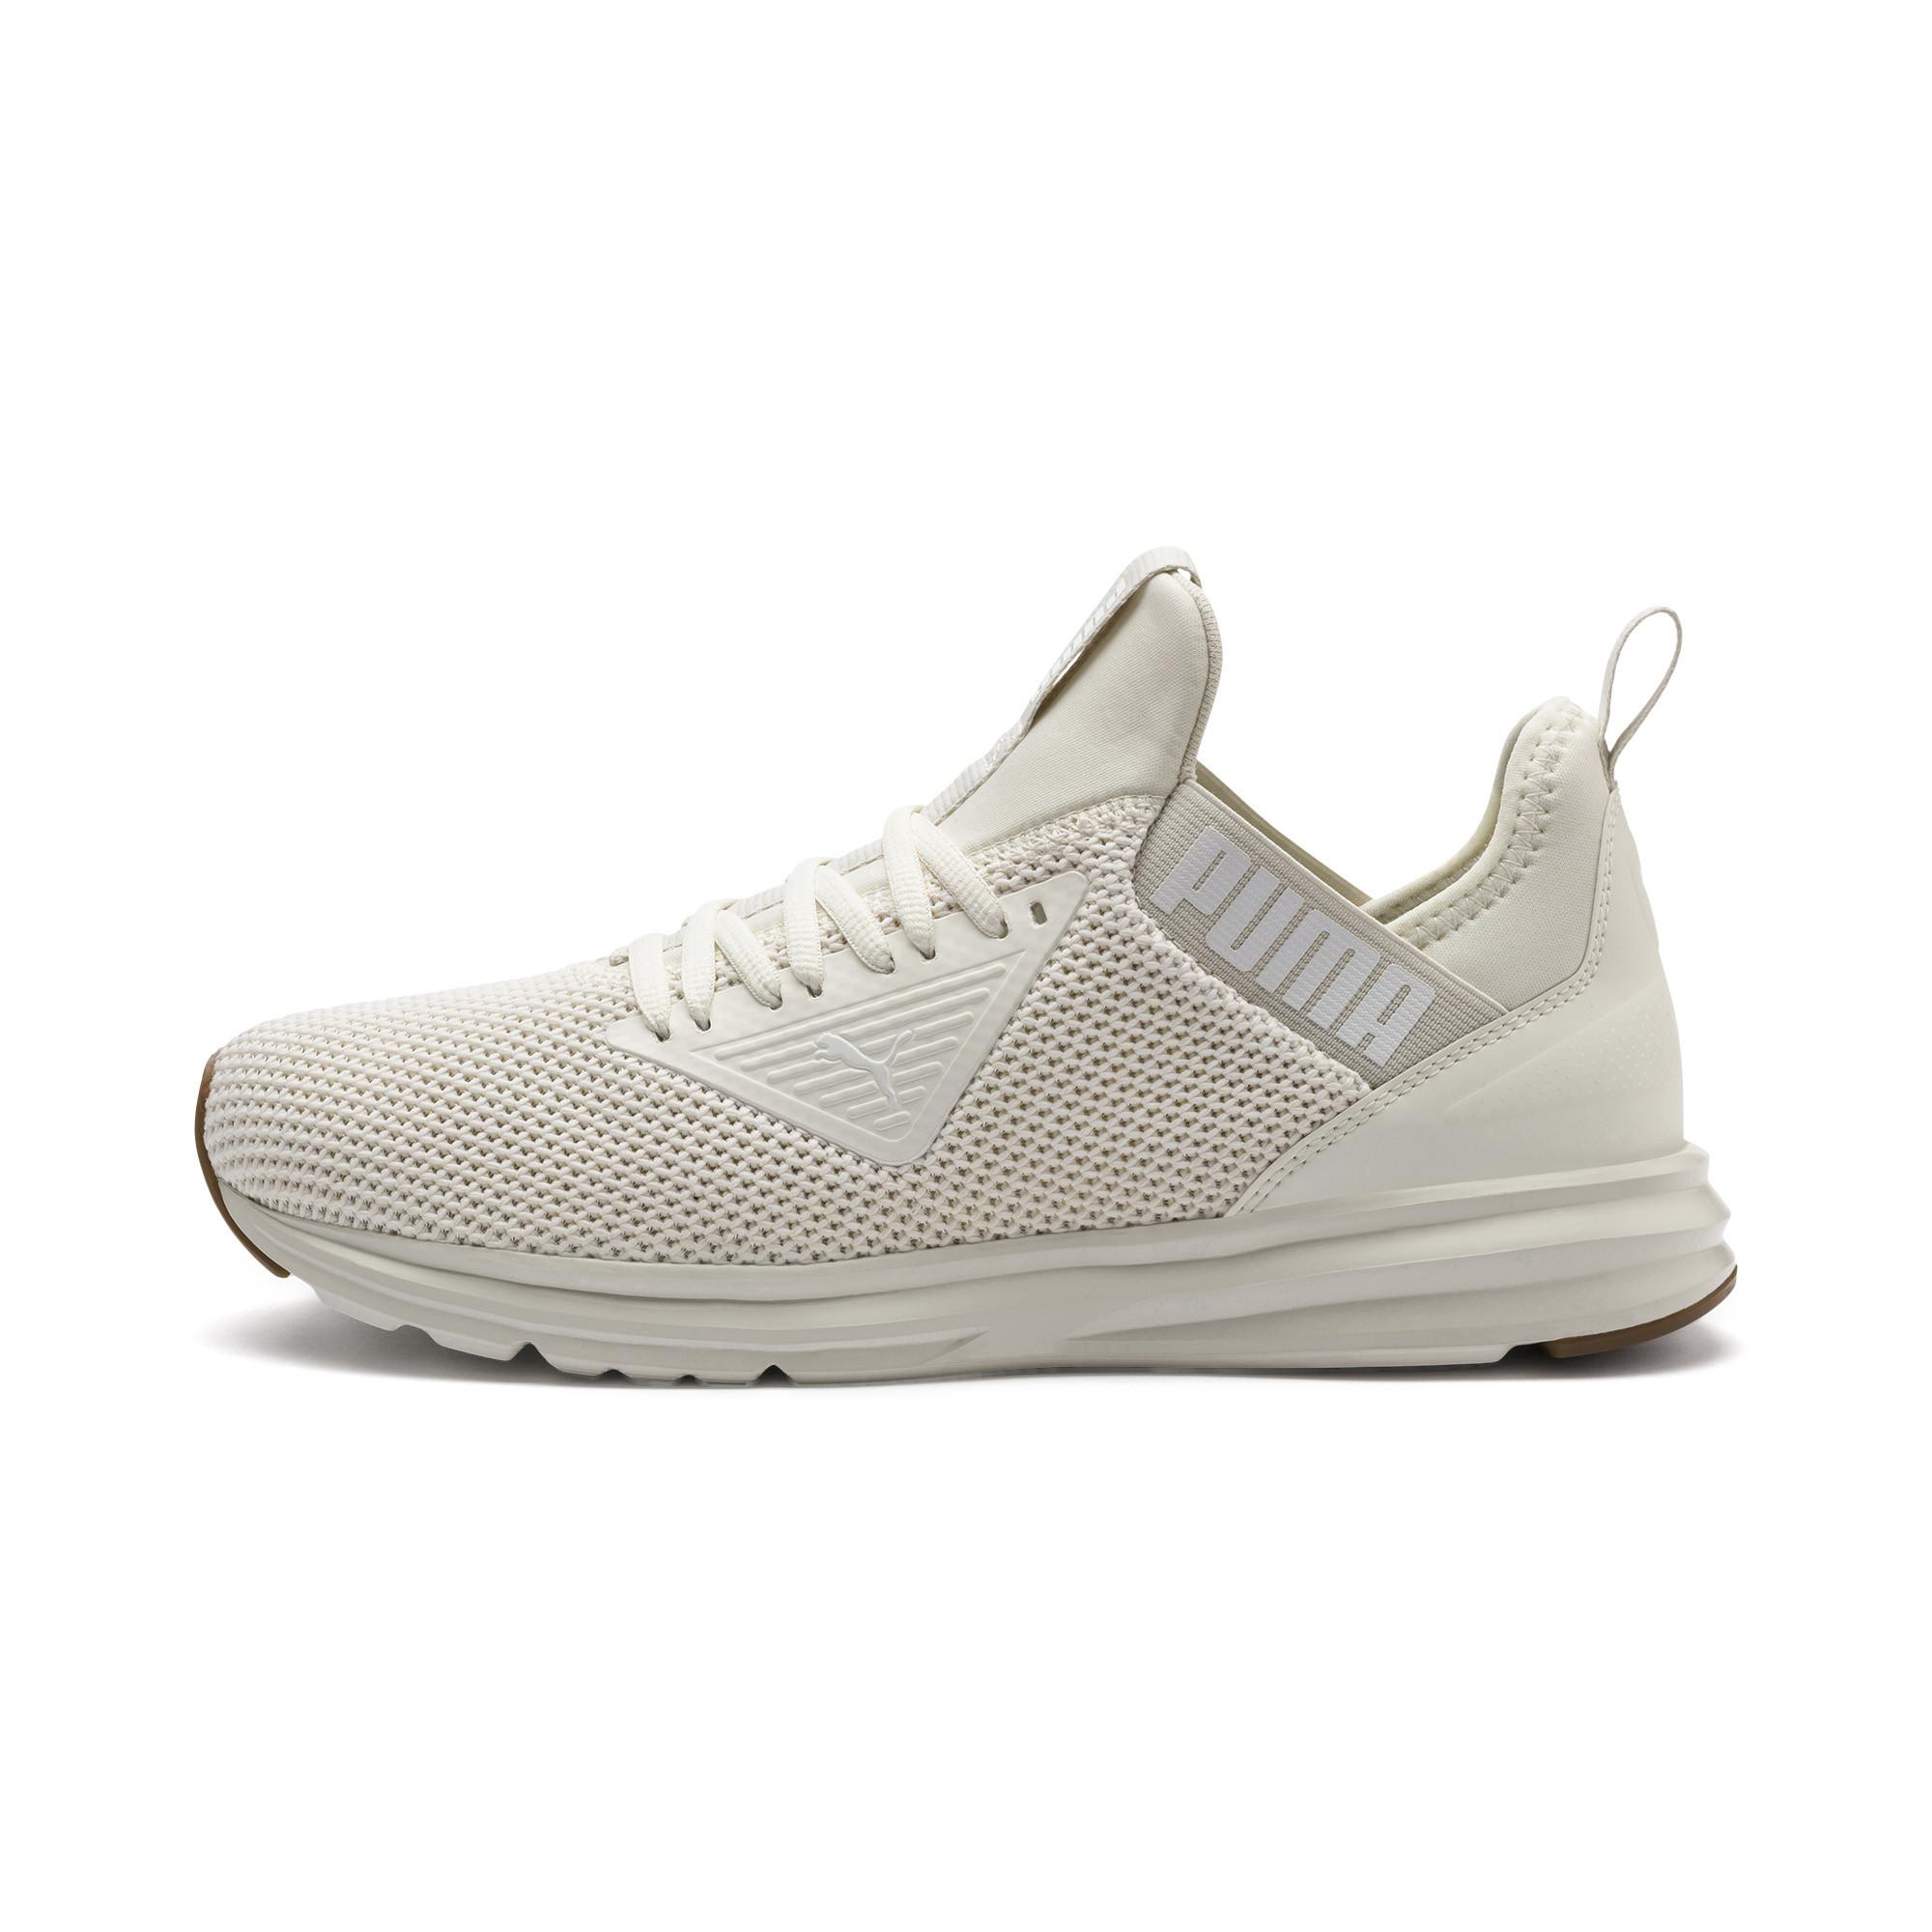 576e649075e954 Lyst - PUMA Enzo Beta Woven Men s Training Shoes in White for Men